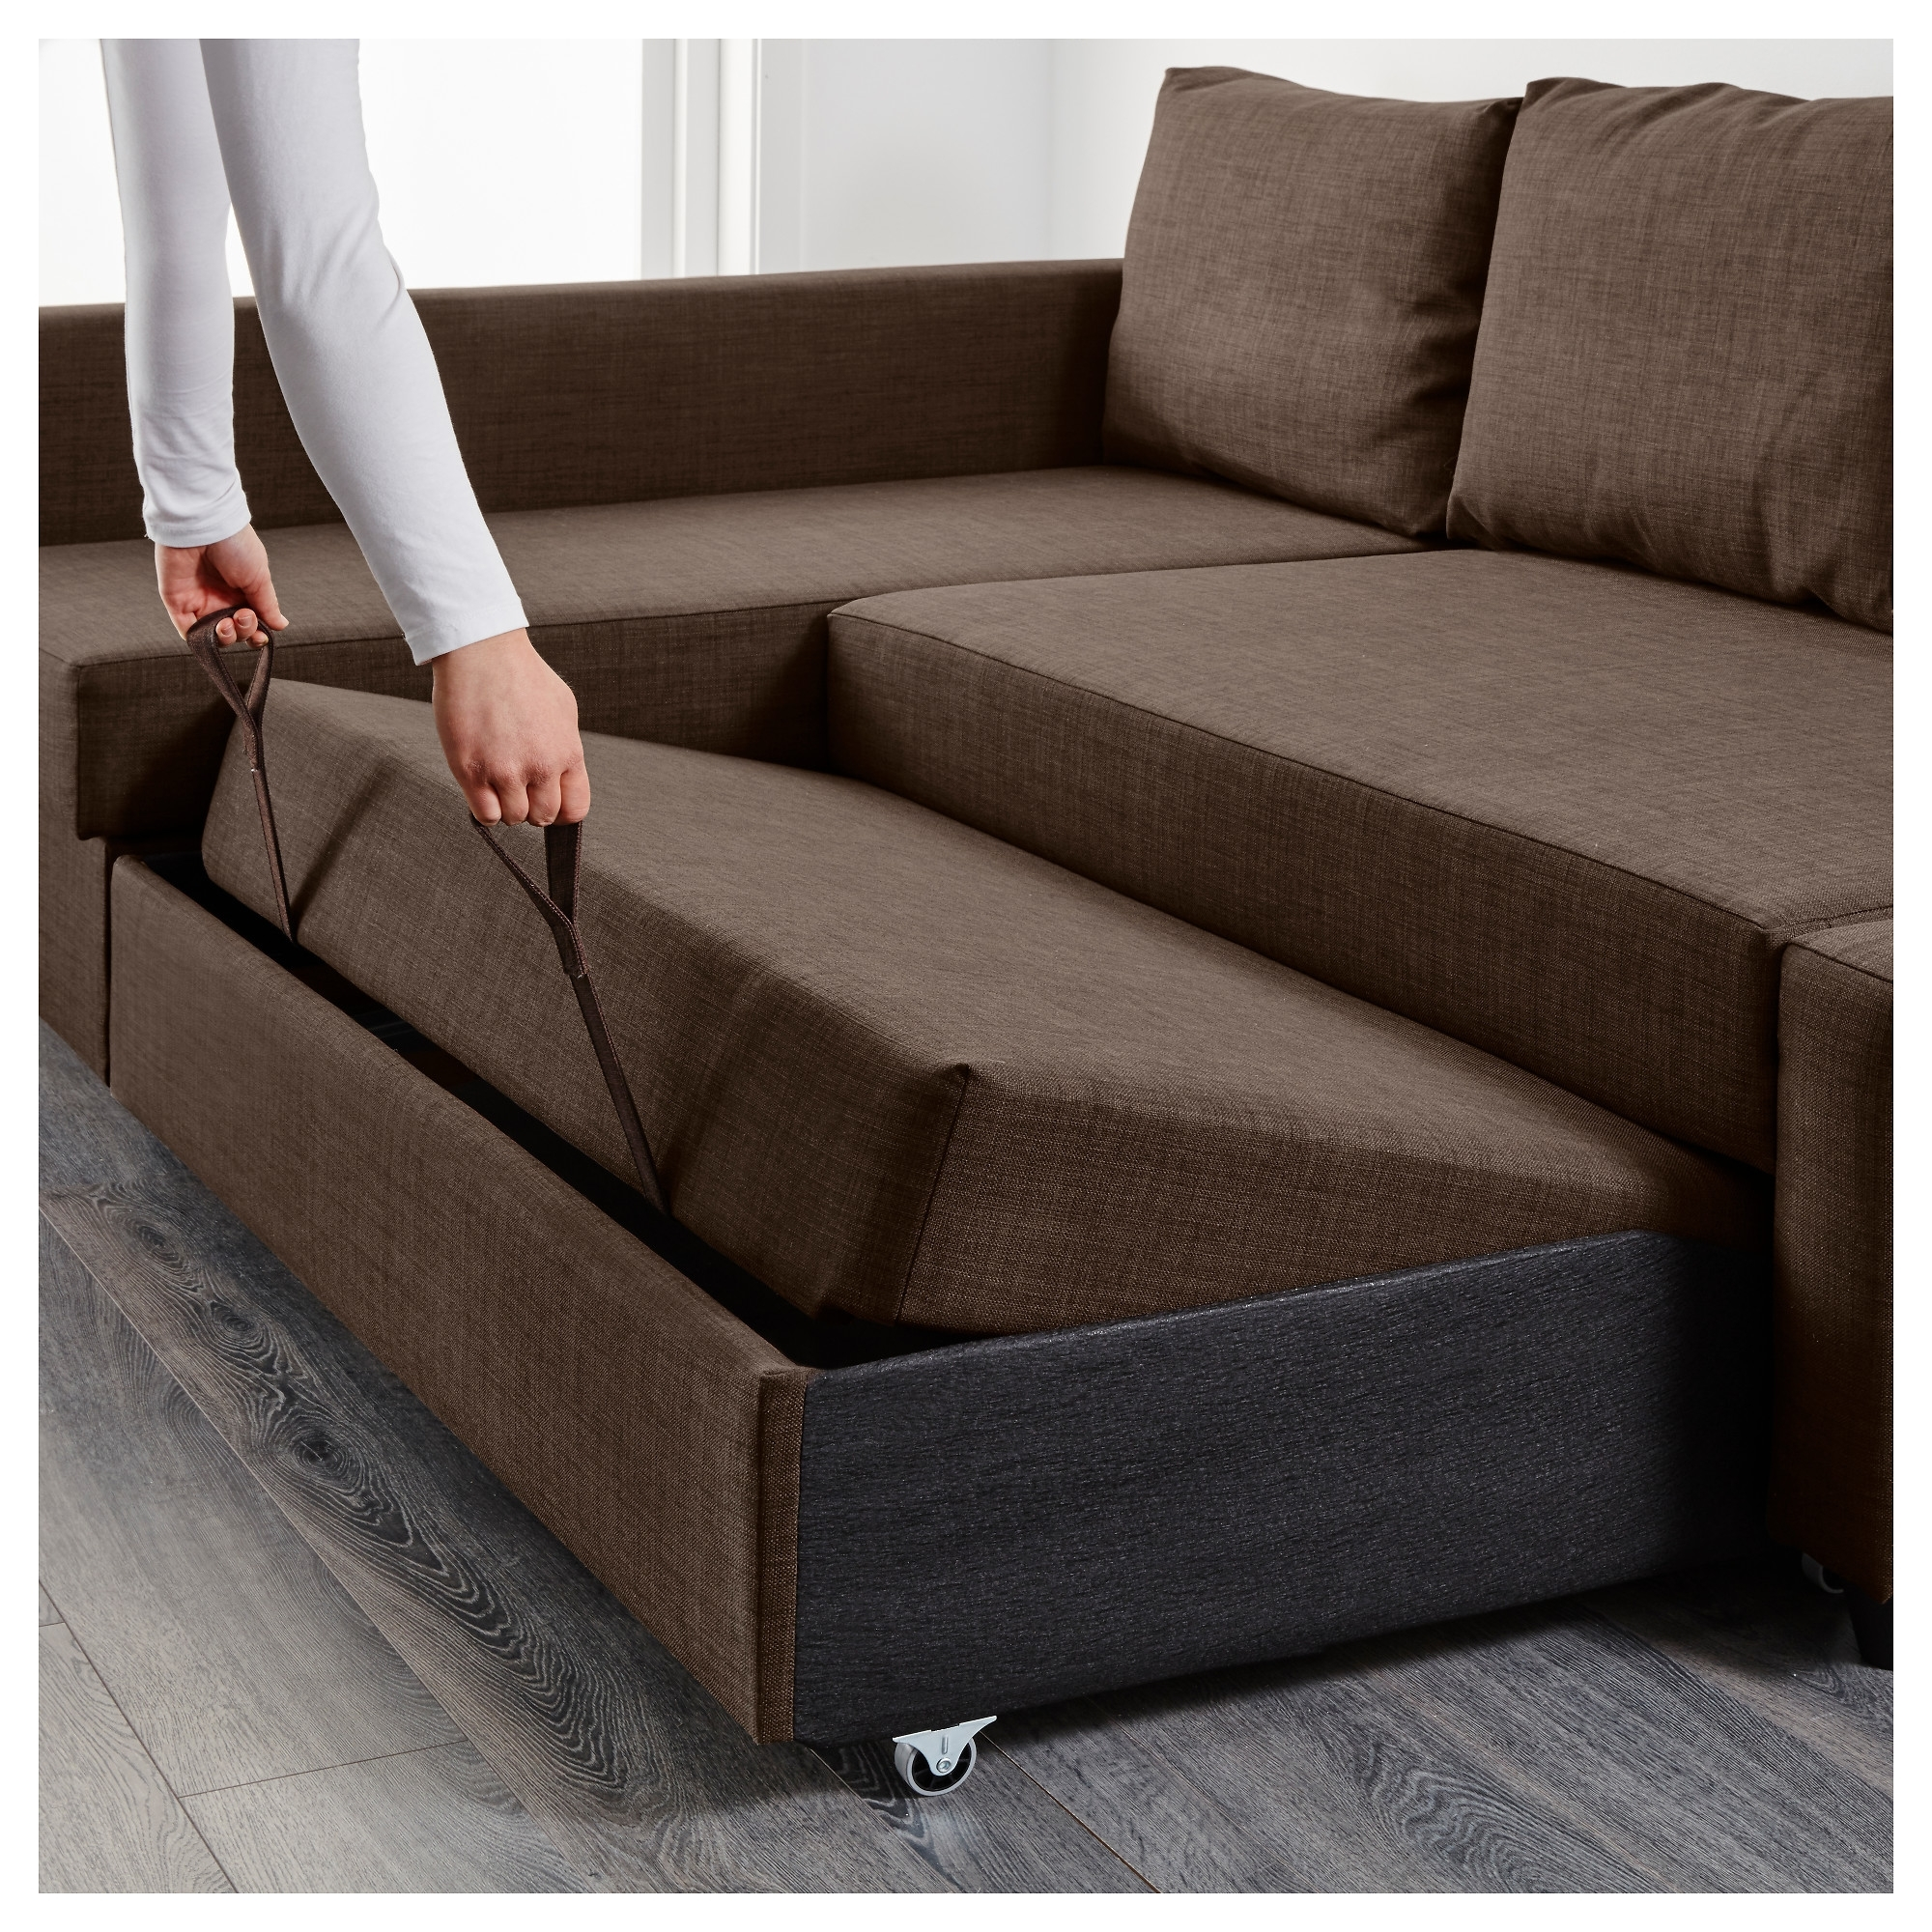 Friheten Sleeper Sectional,3 Seat W/storage – Skiftebo Dark Gray – Ikea Inside Ikea Sectional Sleeper Sofas (Image 5 of 10)